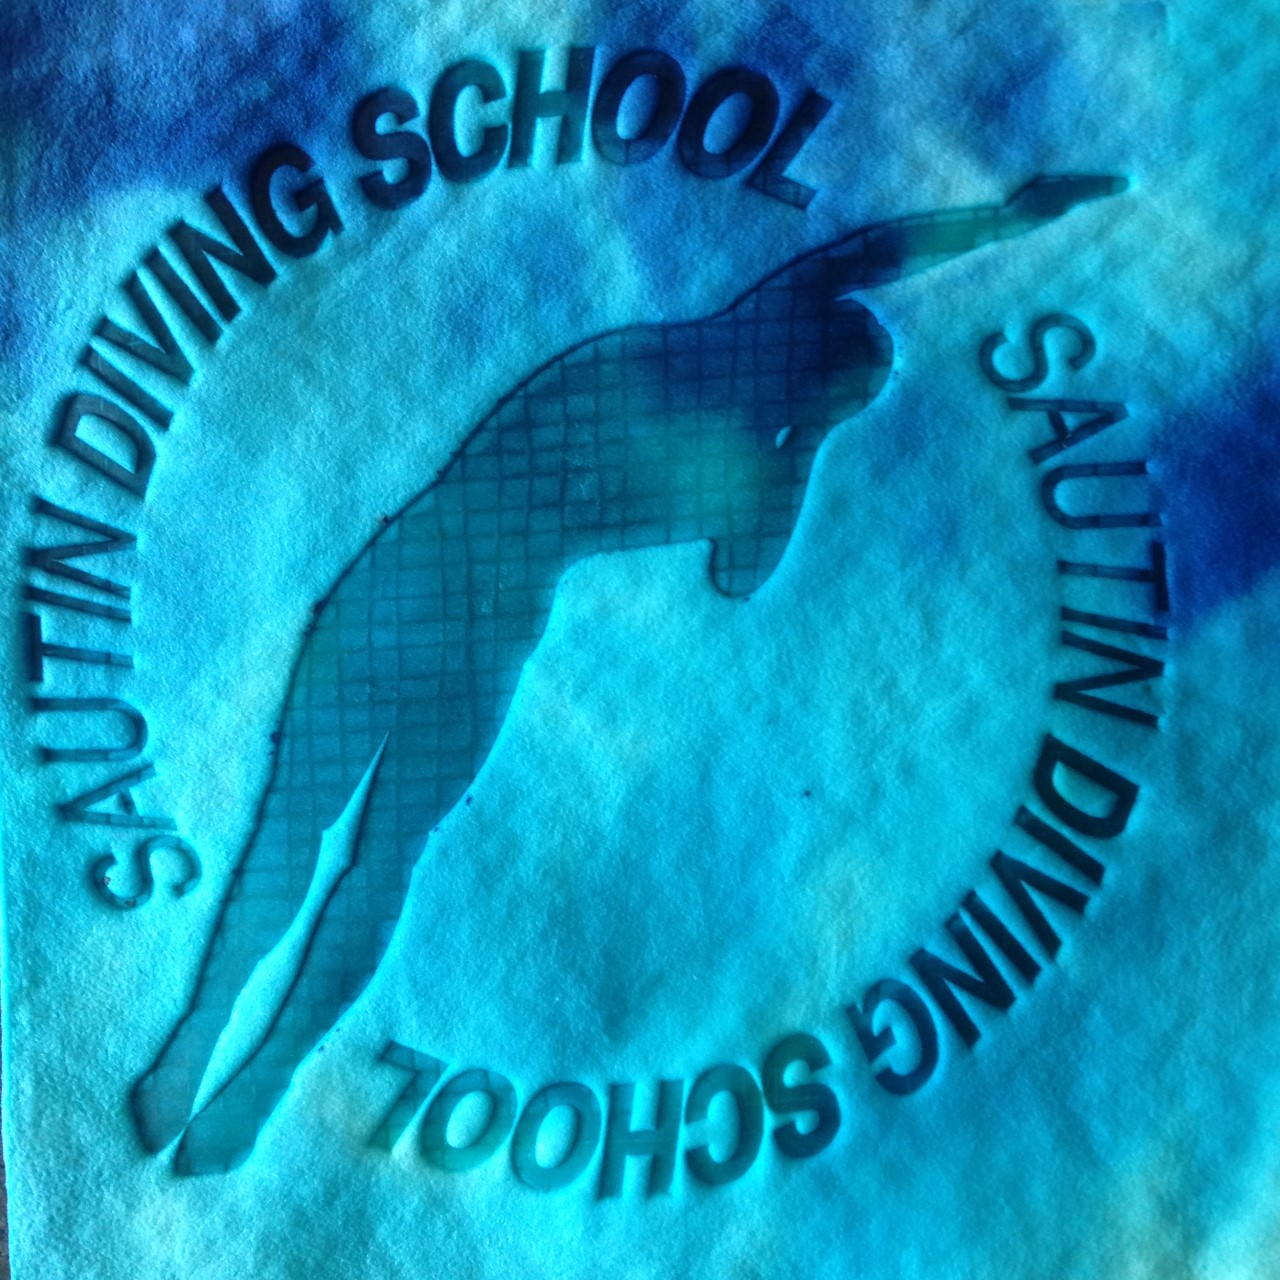 Sautin Diving School